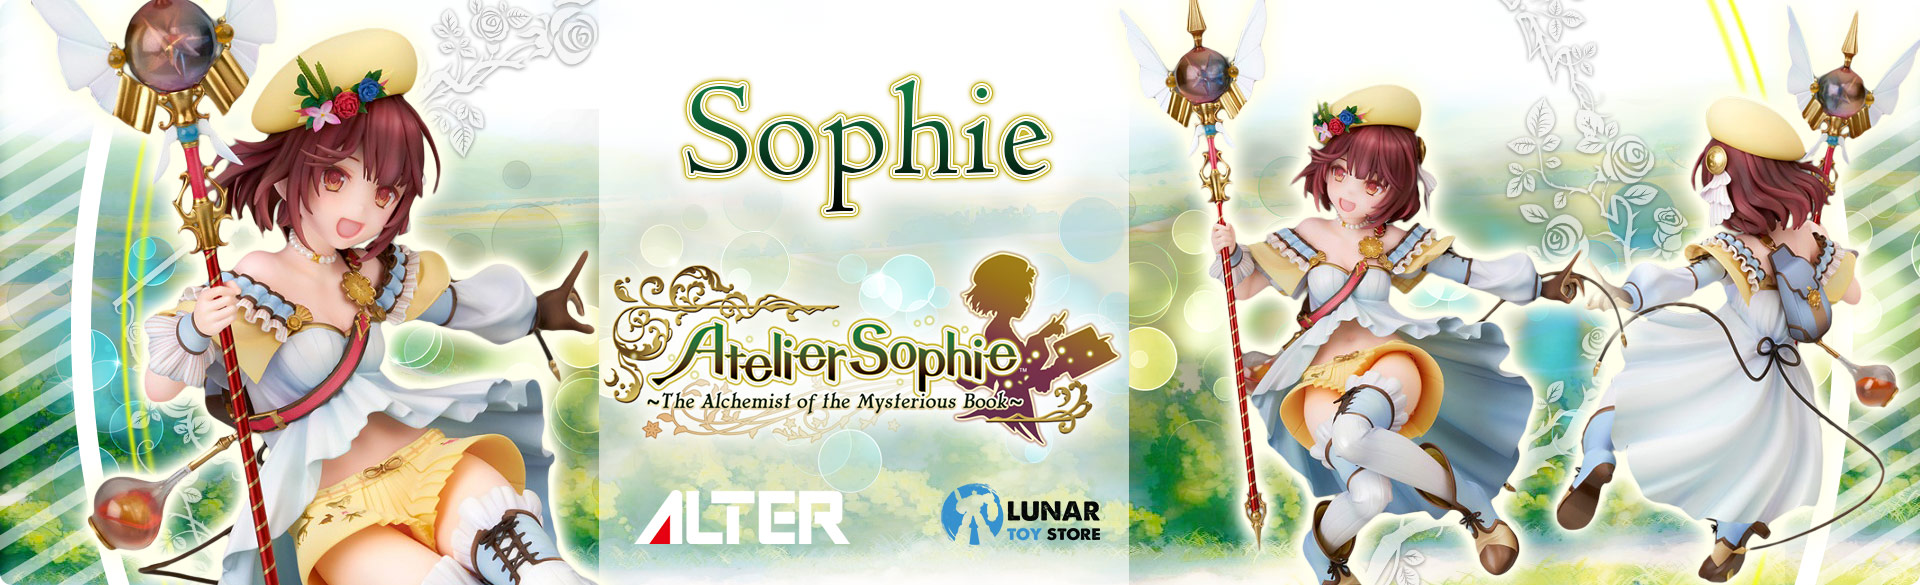 Sophie - Atelier Sophie